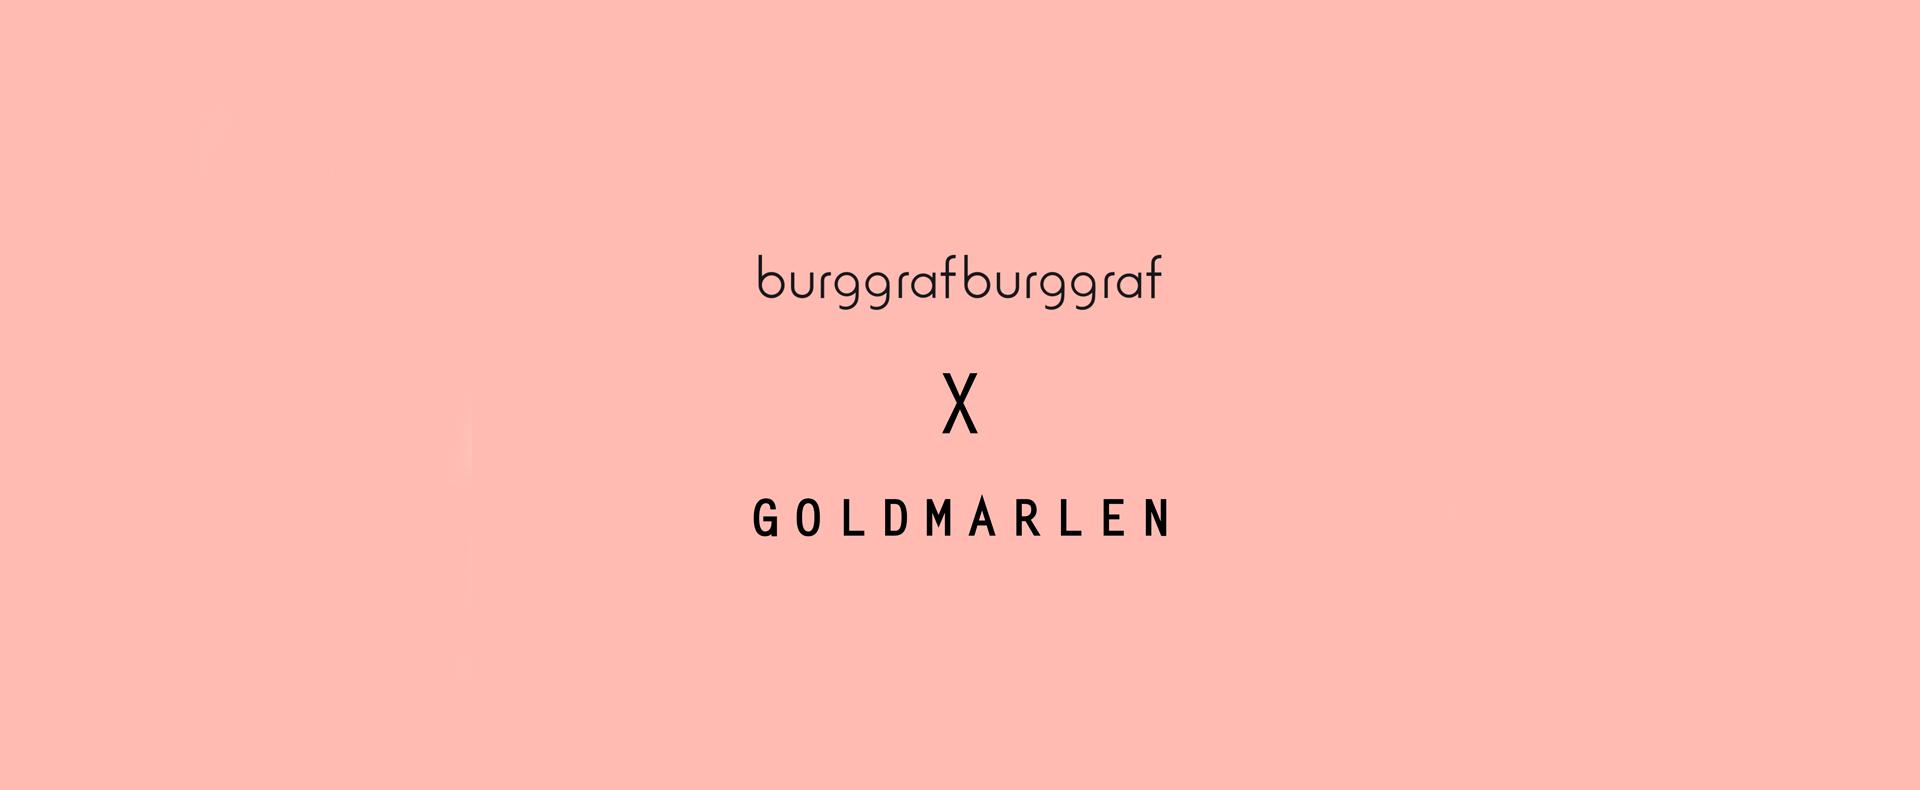 burggrafburggraf-X-goldmarlen-Kooperation-accessoire-schmuck